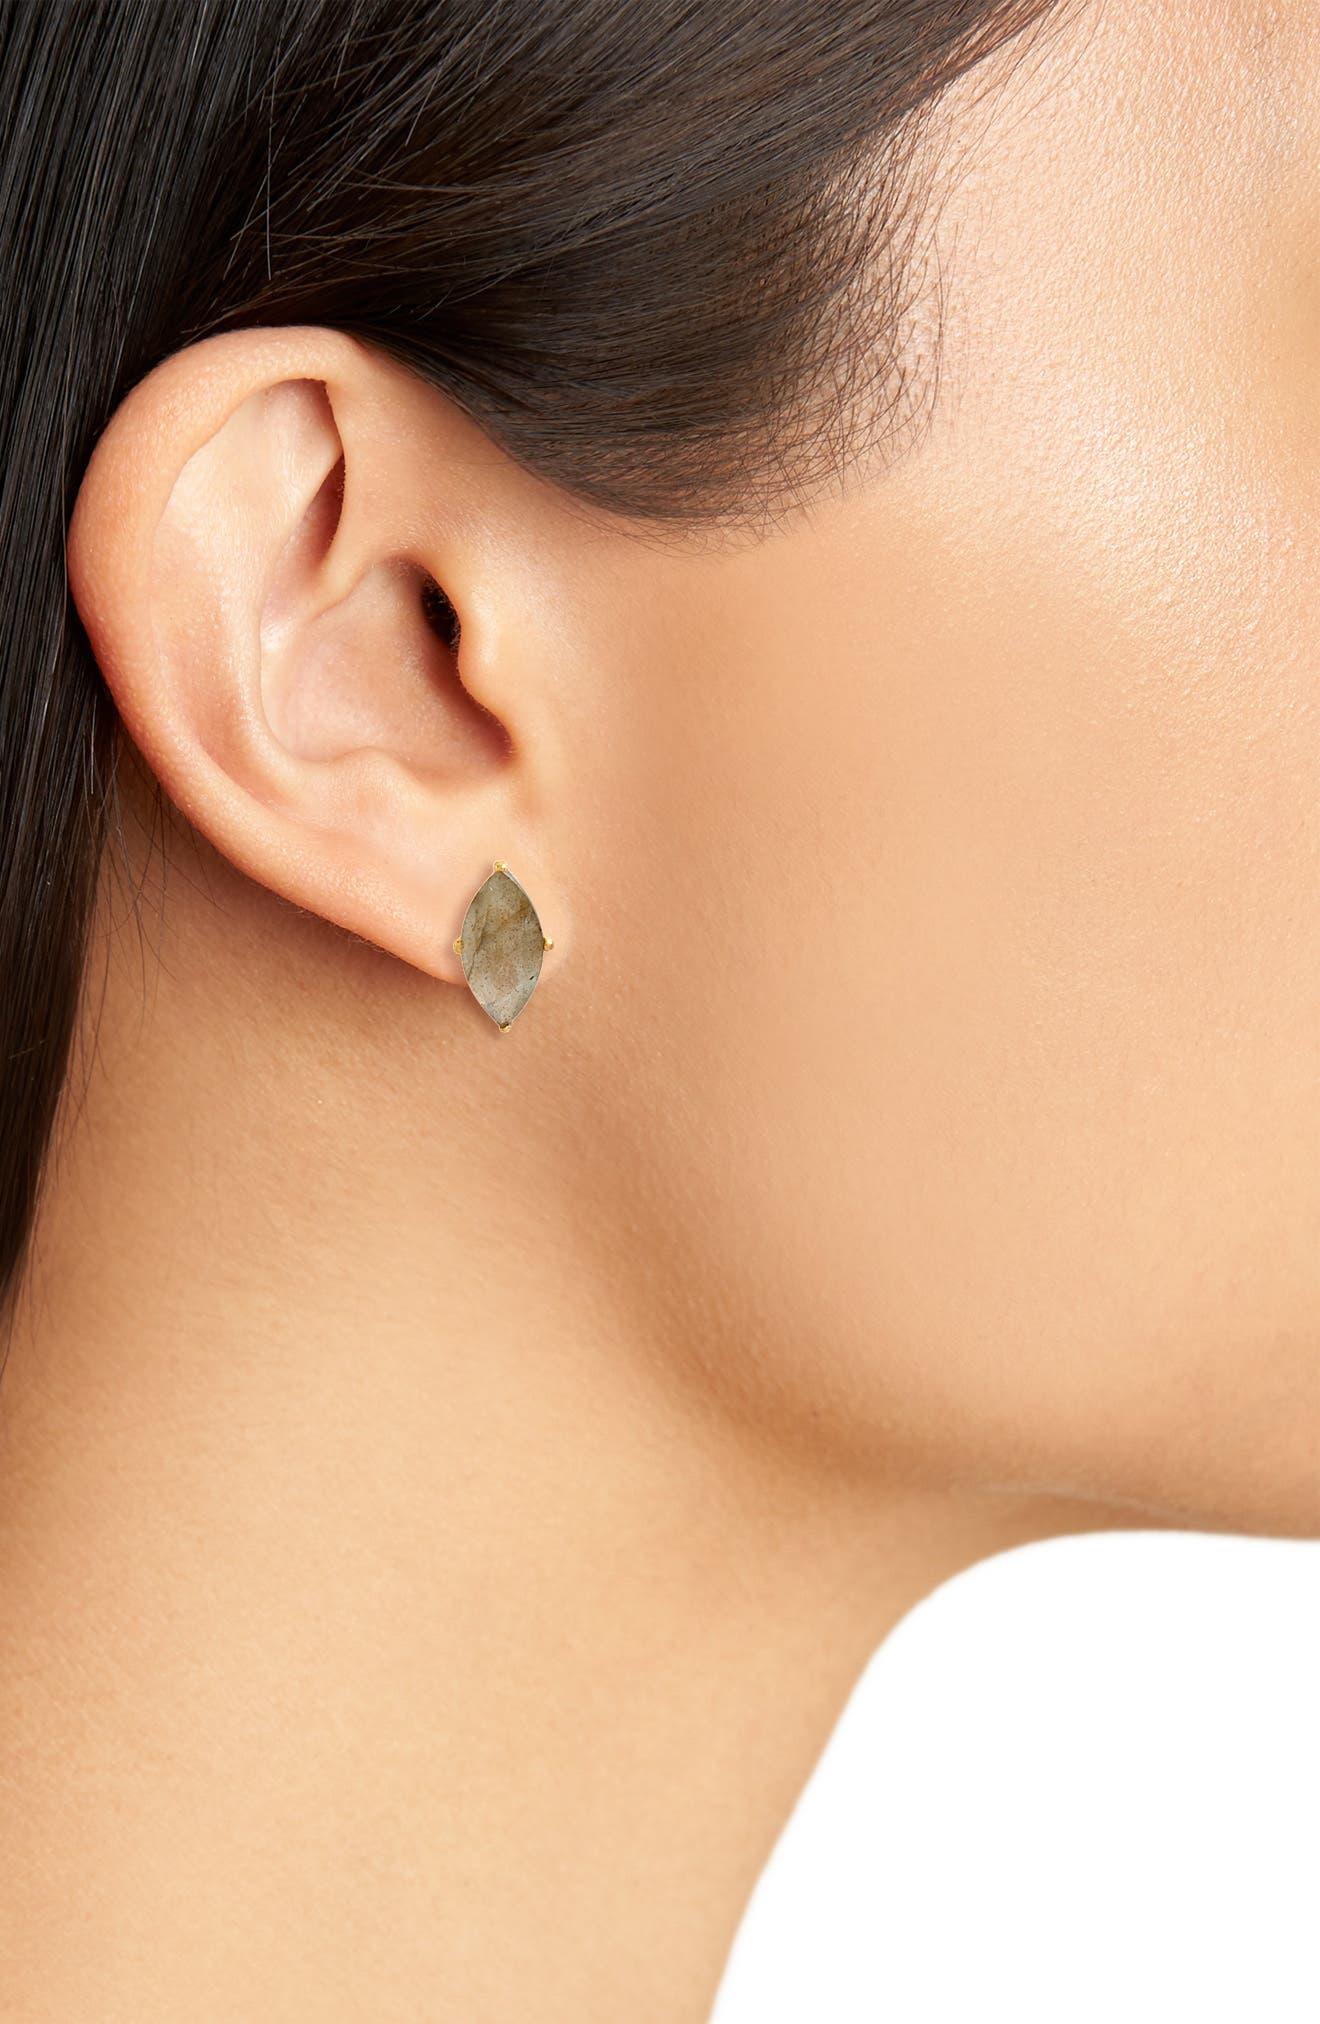 Lotus Stud Earrings,                             Alternate thumbnail 2, color,                             710